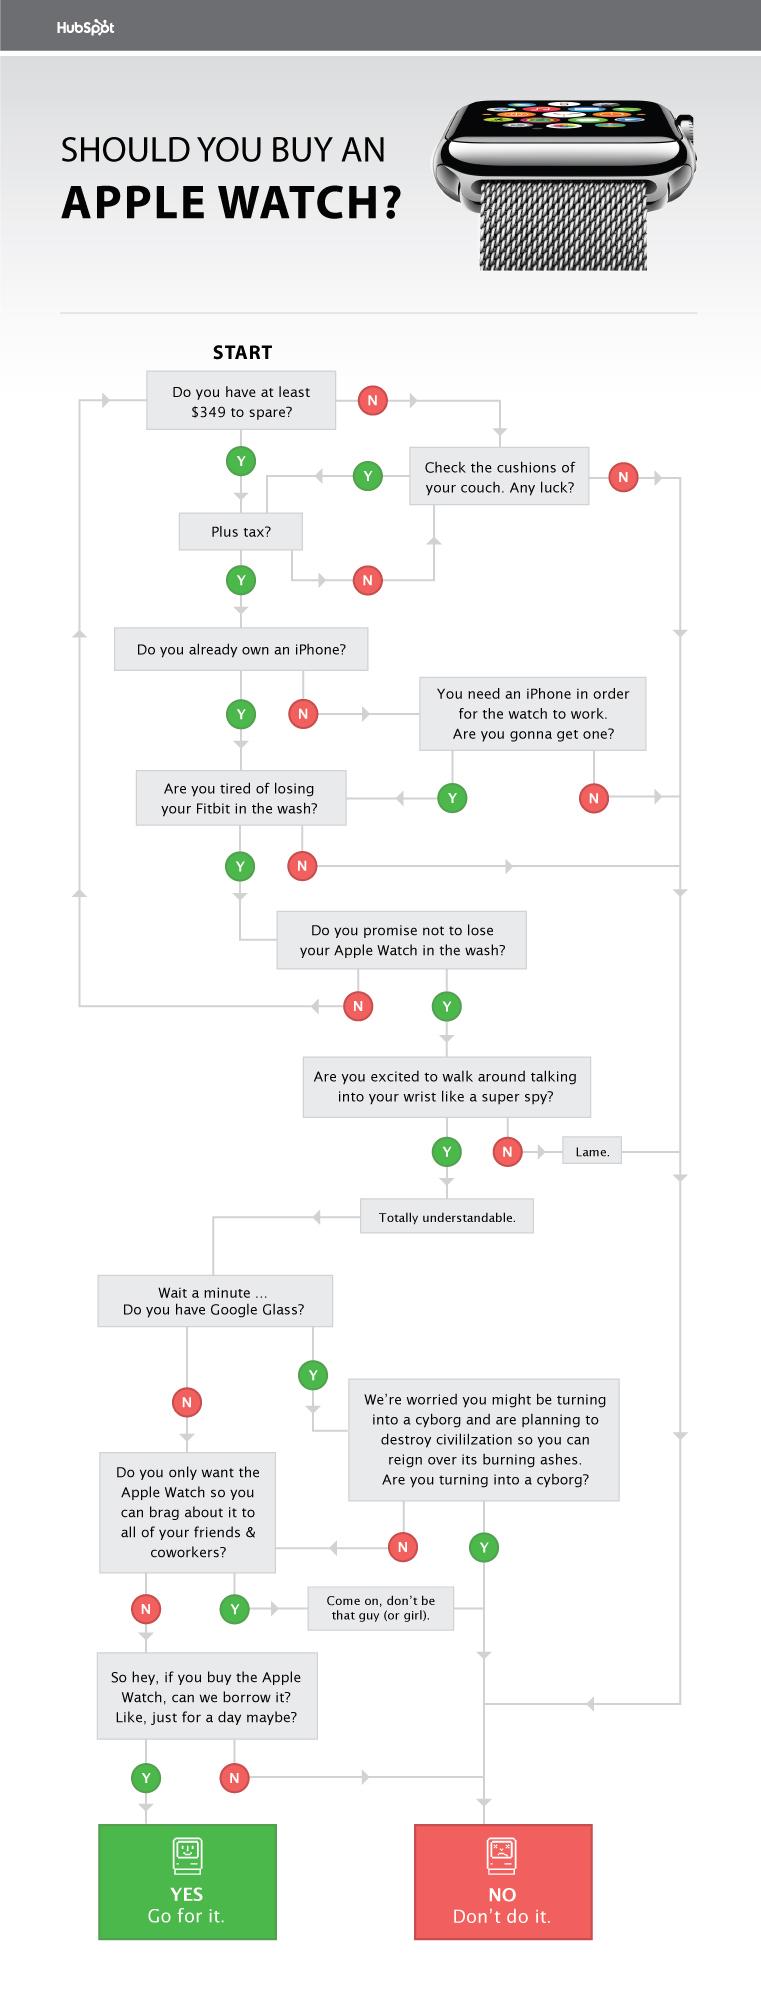 Should you buy the apple watch flowchart should you buy an apple watch flowchart nvjuhfo Images